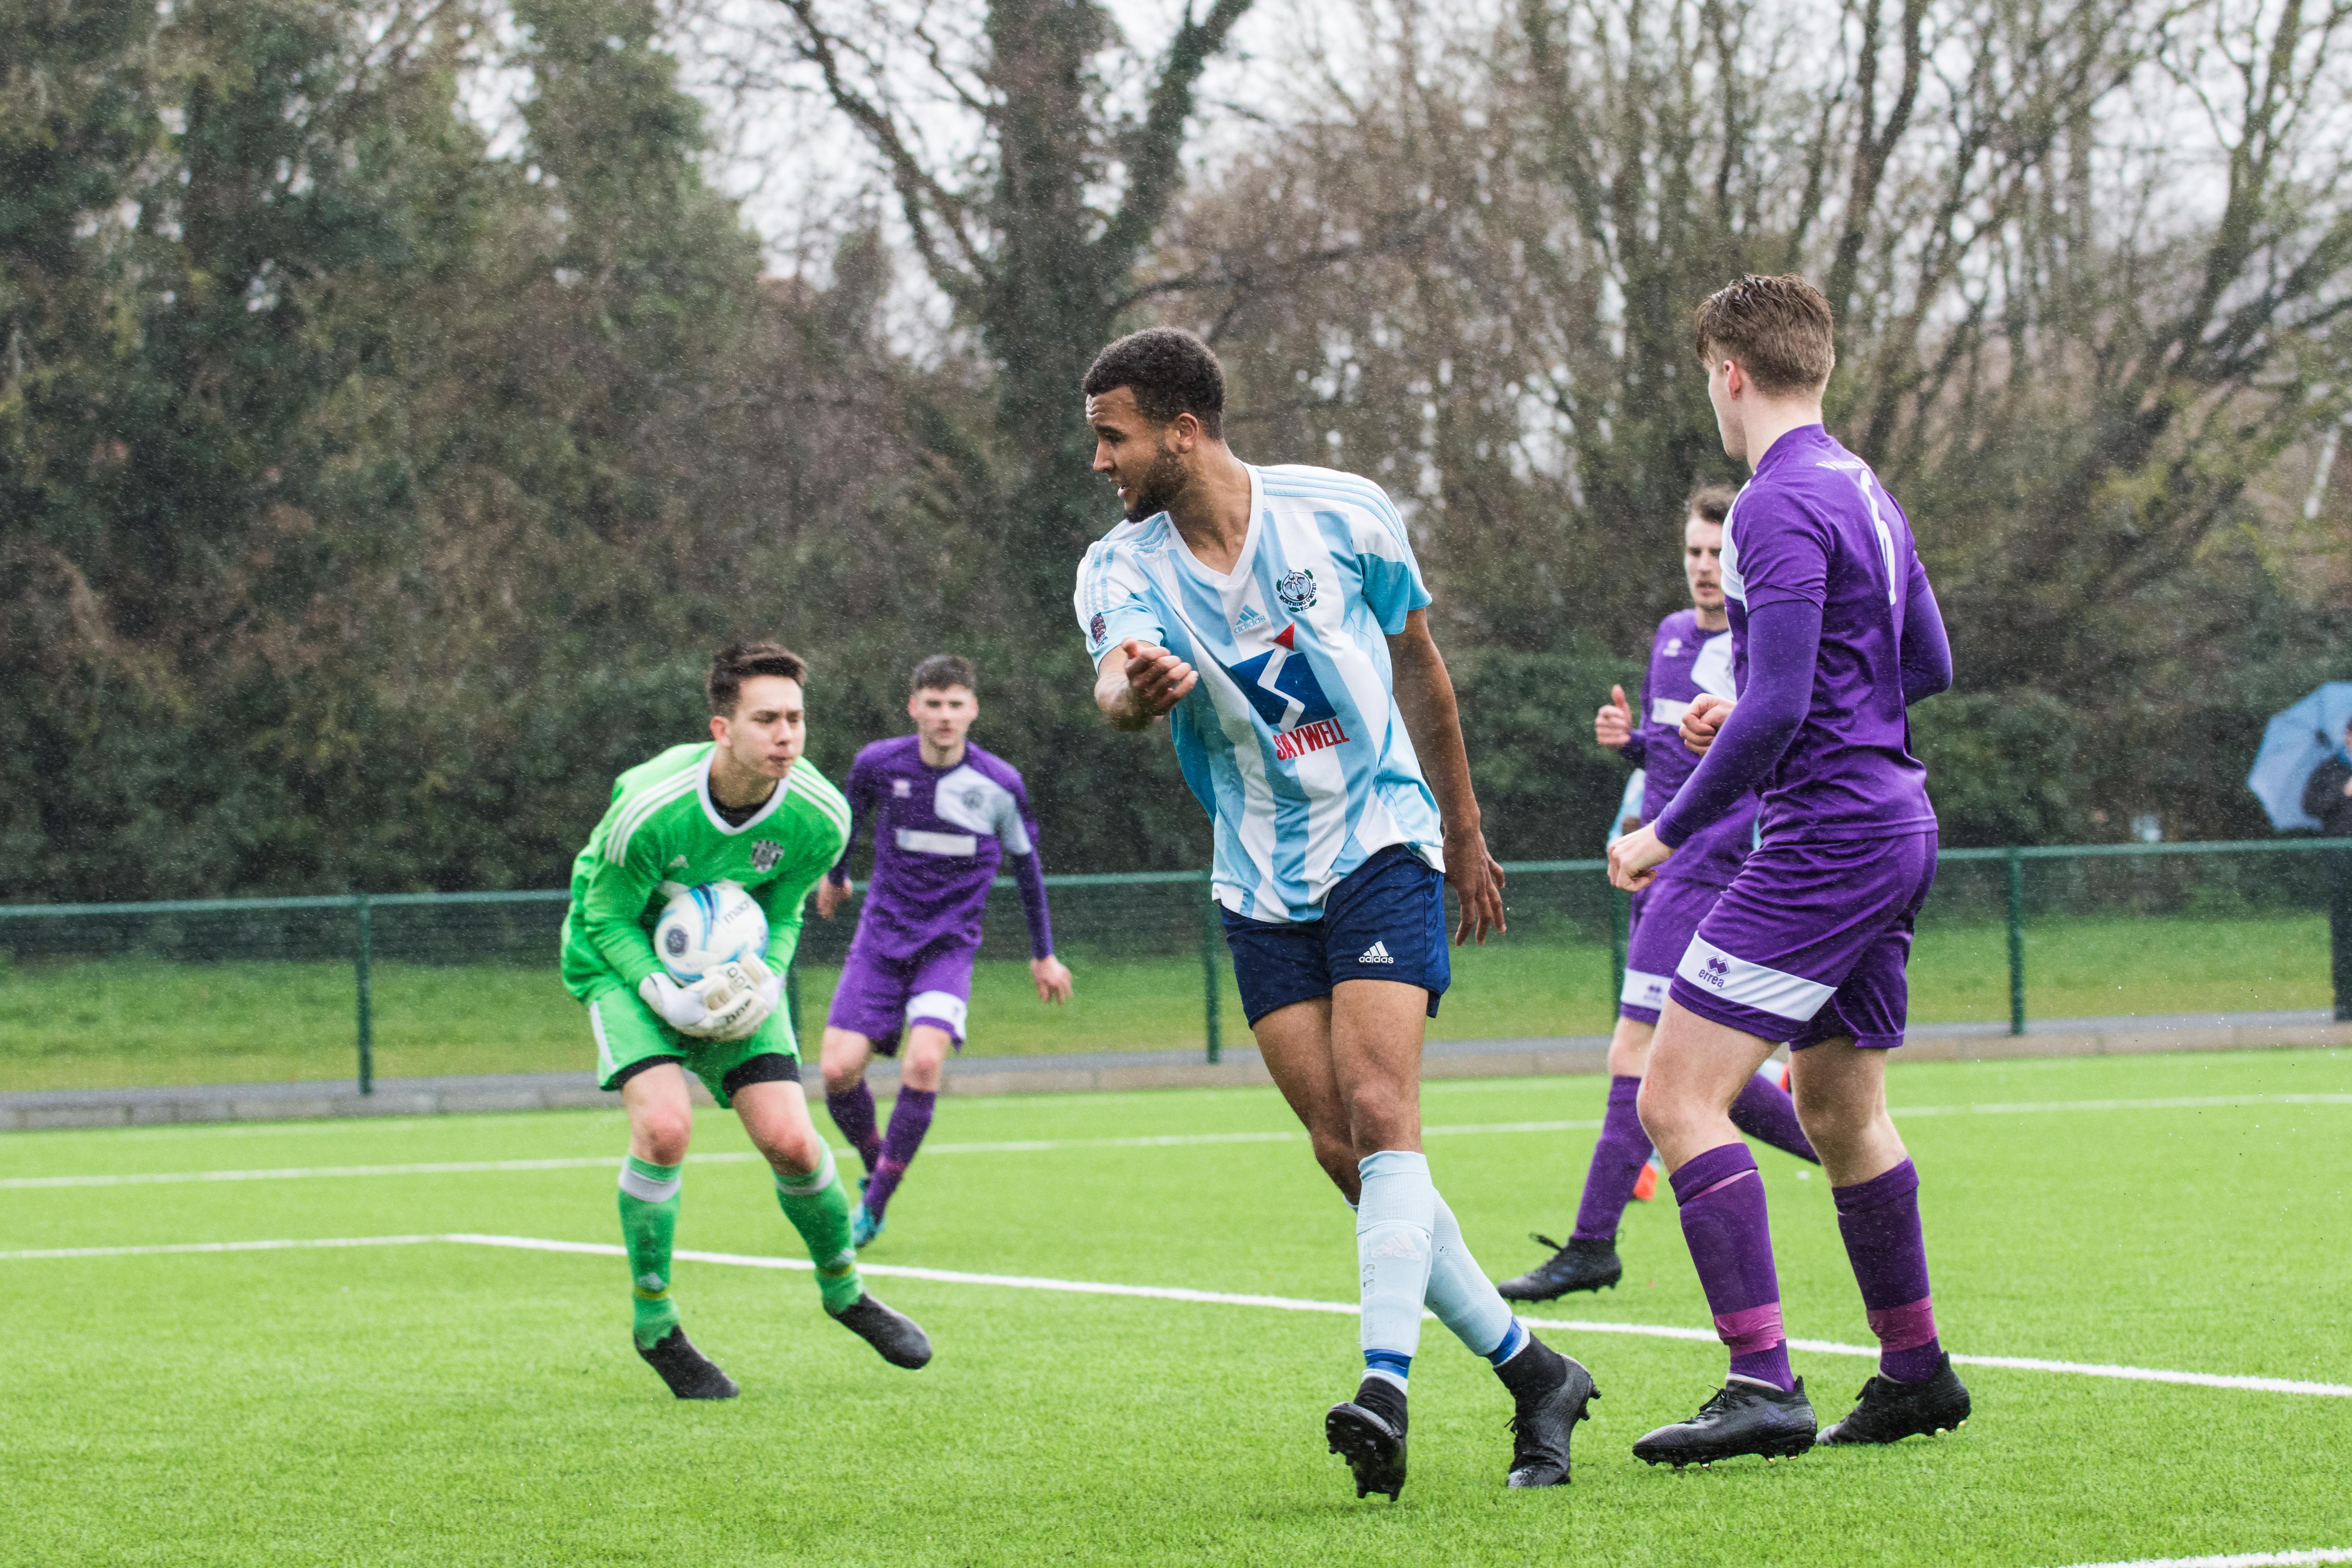 DAVID_JEFFERY Worthing United FC vs East Preston FC 02.04.18 80